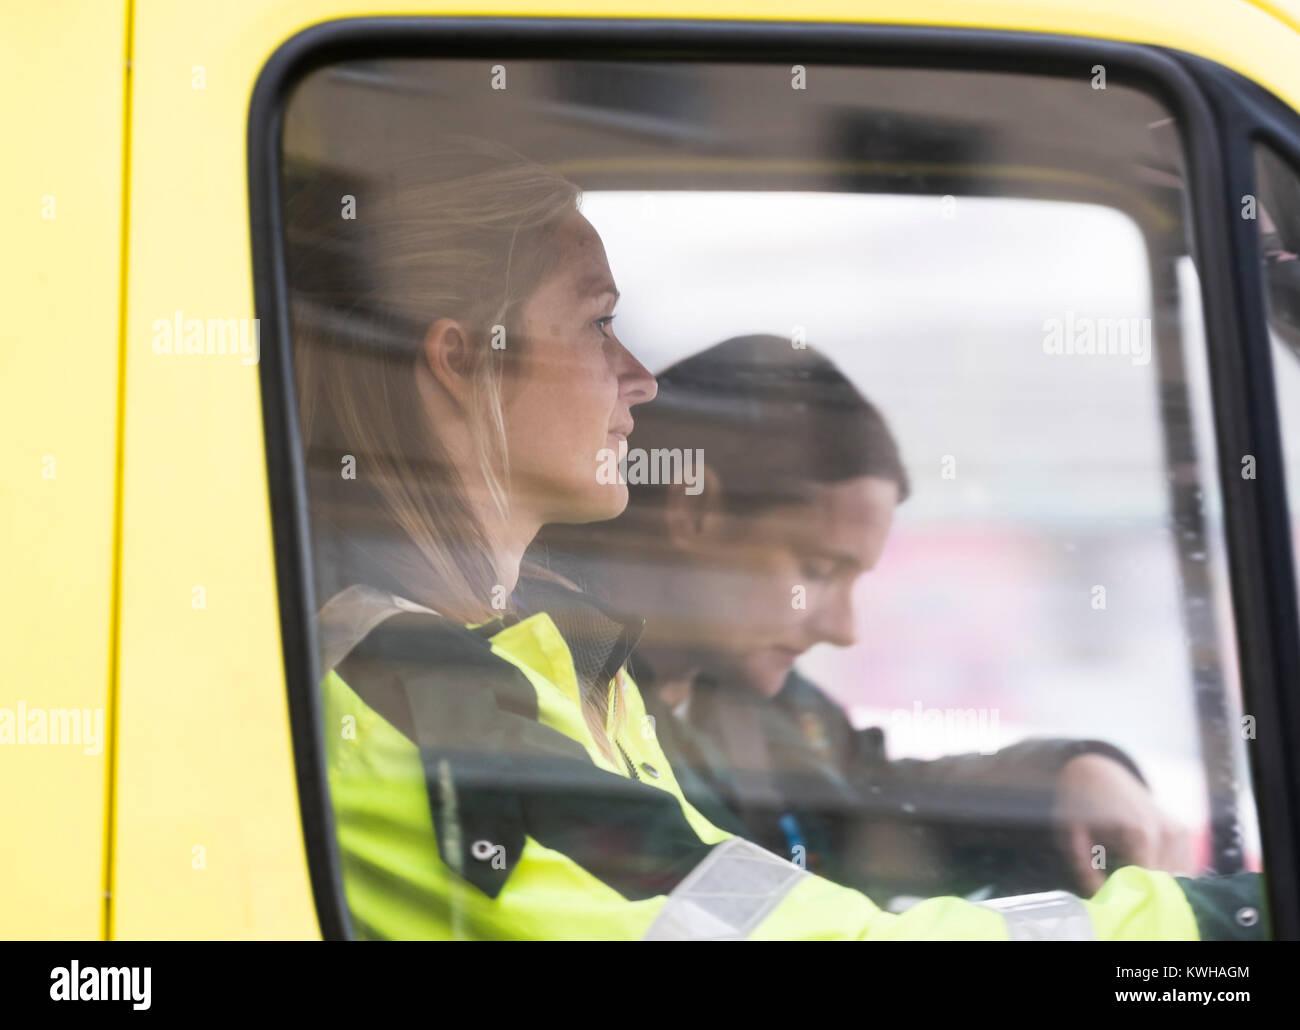 Female paramedics and NHS ambulance driver in England, UK. - Stock Image